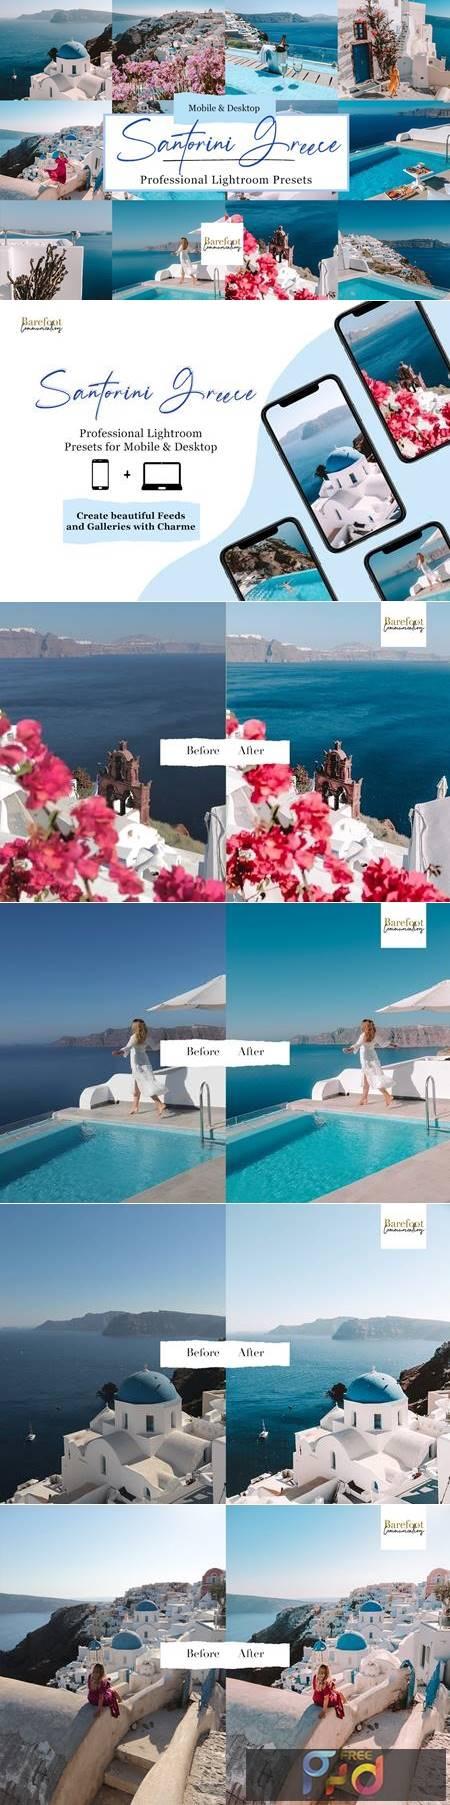 Santorini Blue Lightroom Presets 5254839 1